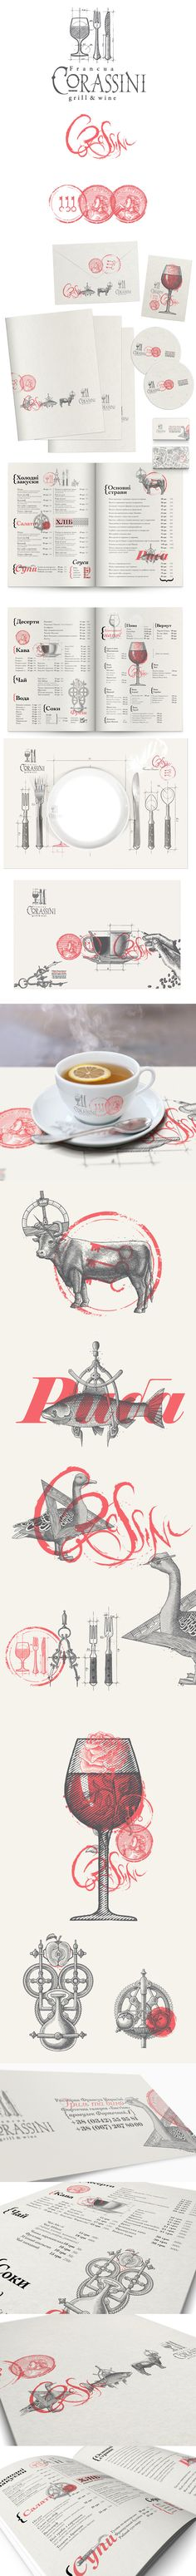 Corassini branding by Yaroslav Shkriblyak, via Behance | #stationary #corporate #design #corporatedesign #identity #branding